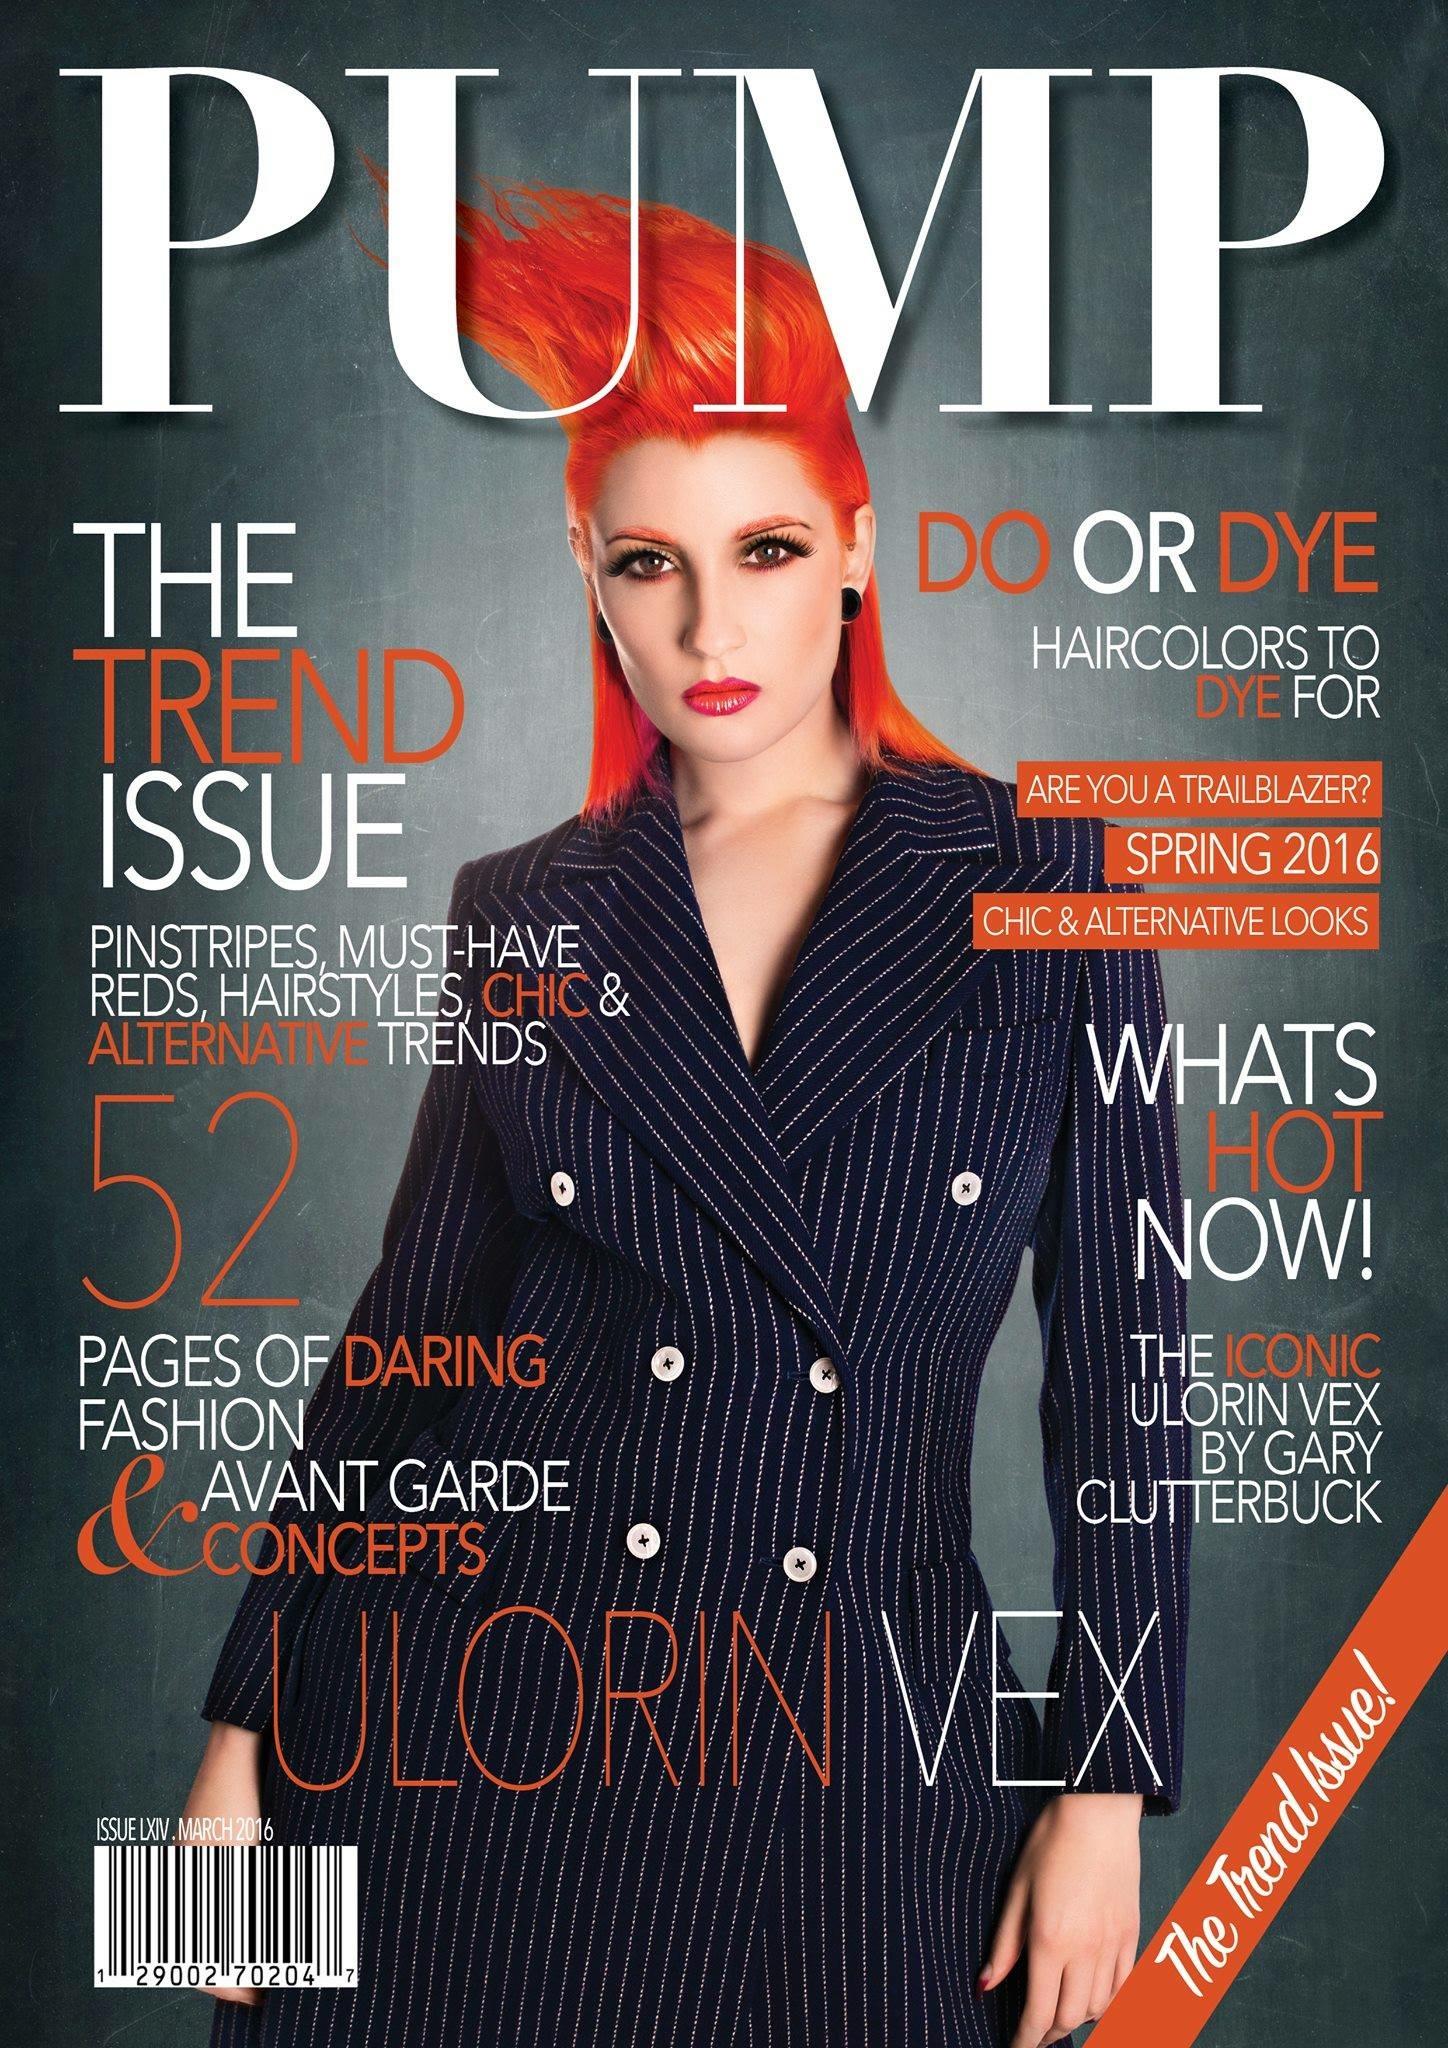 Pump Magazine the Trend Issue